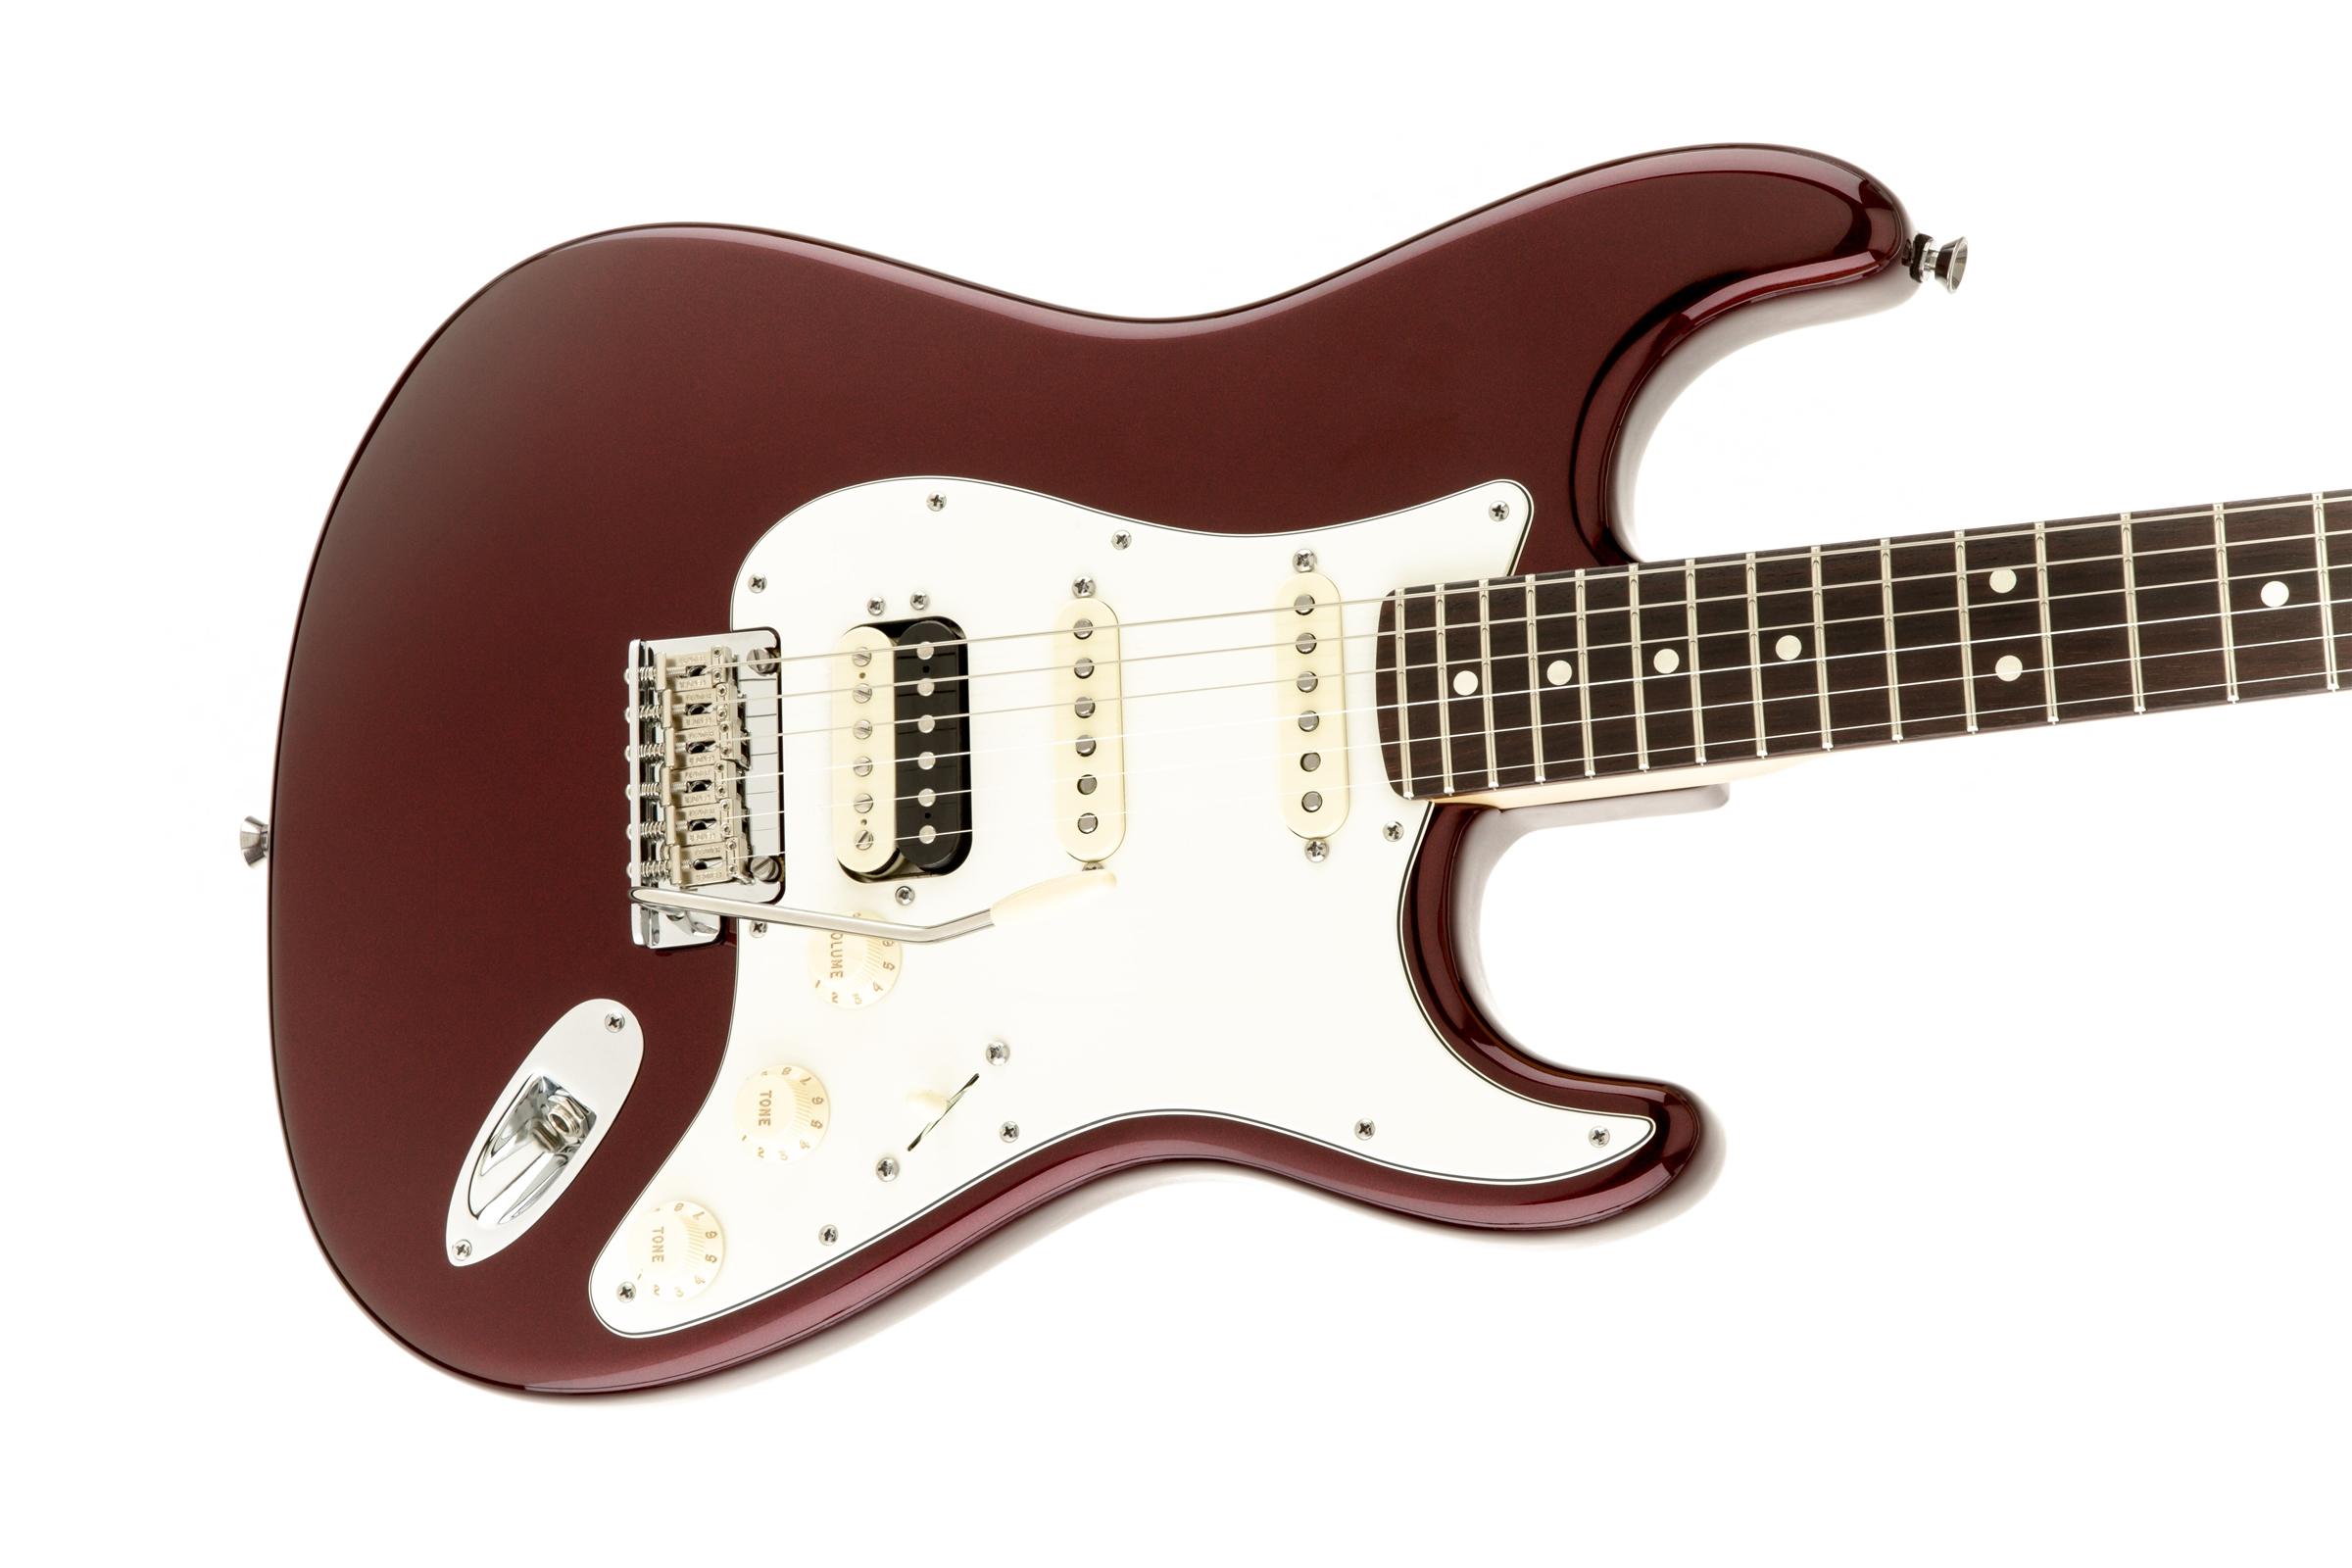 Fender American Standard Stratocaster® HSS Shawbucker™ Bordeaux Metallic Rosewood Fingerboard Electric Guitar